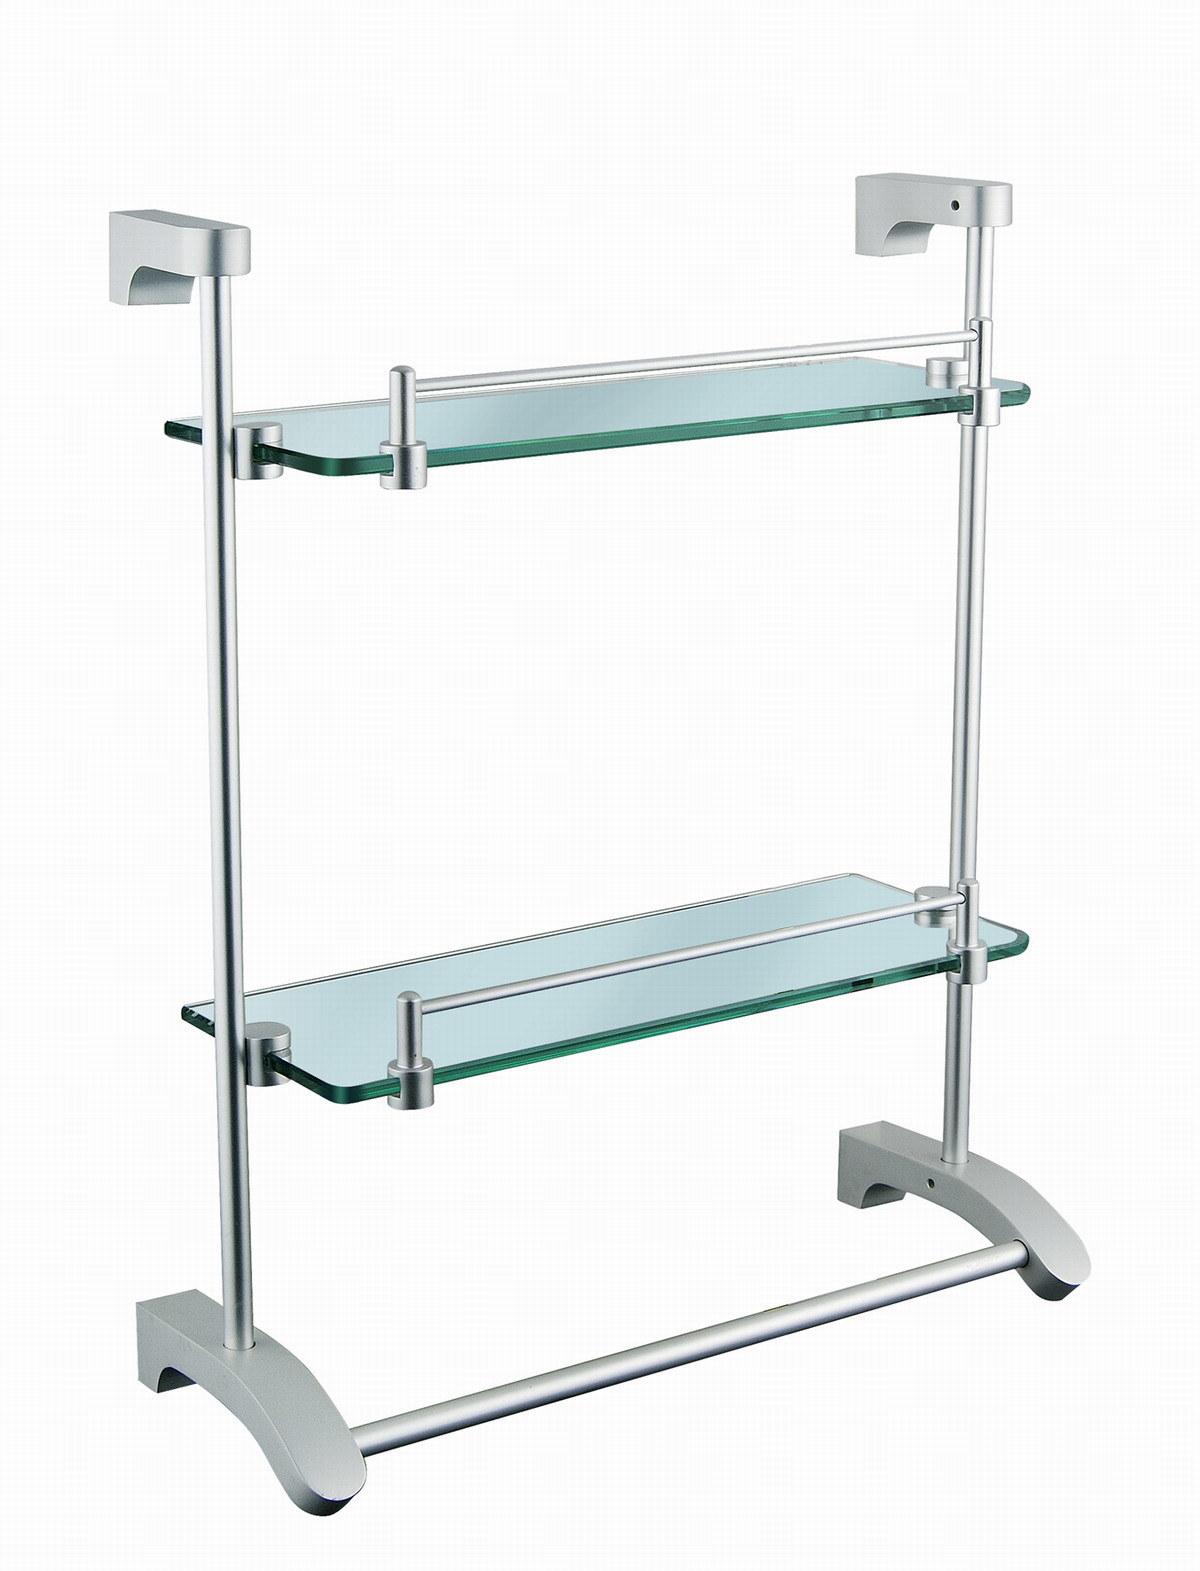 de vidro Encaixe Dobro do banheiro (KD 6614A) –Prateleira de vidro  #24604E 1200x1571 Balança De Banheiro De Vidro